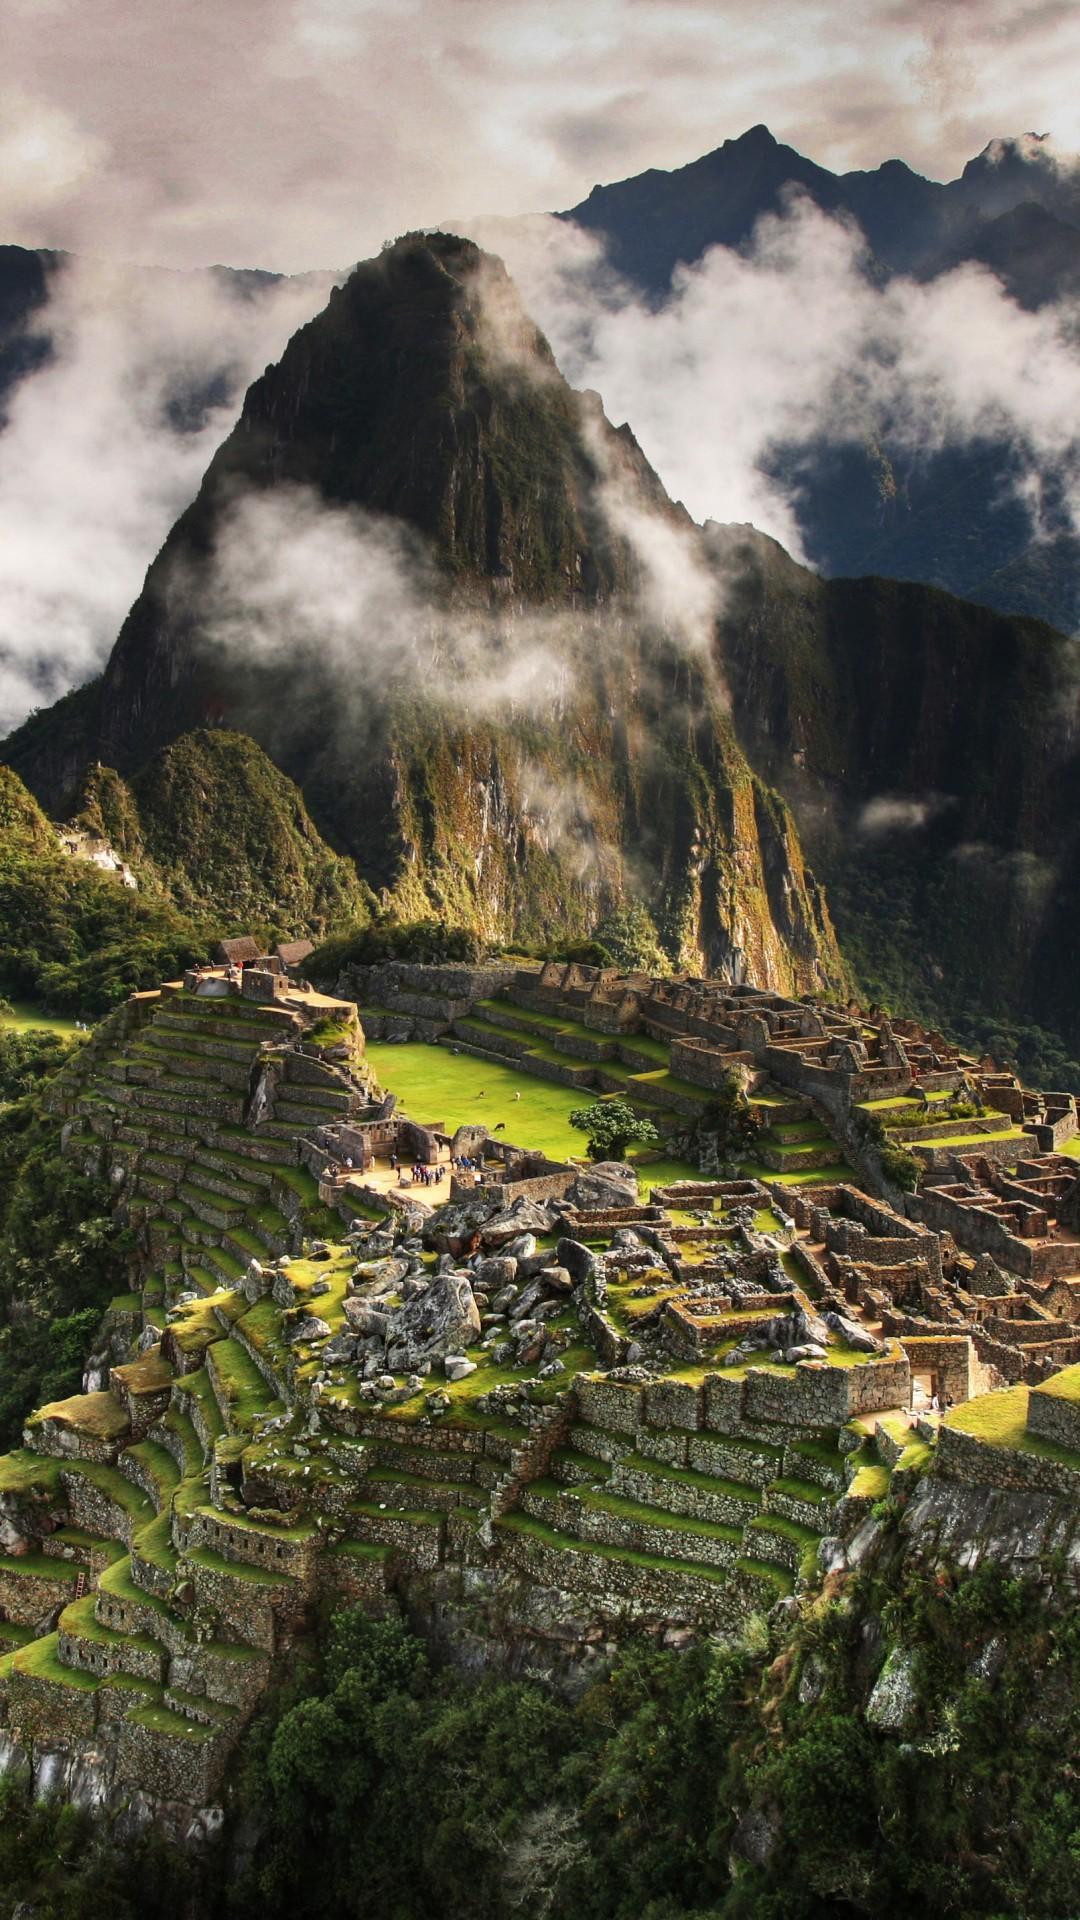 Iphone 5 Hd Wallpaper Abstract Wallpaper Machu Picchu 5k 4k Wallpaper Peru Mountains